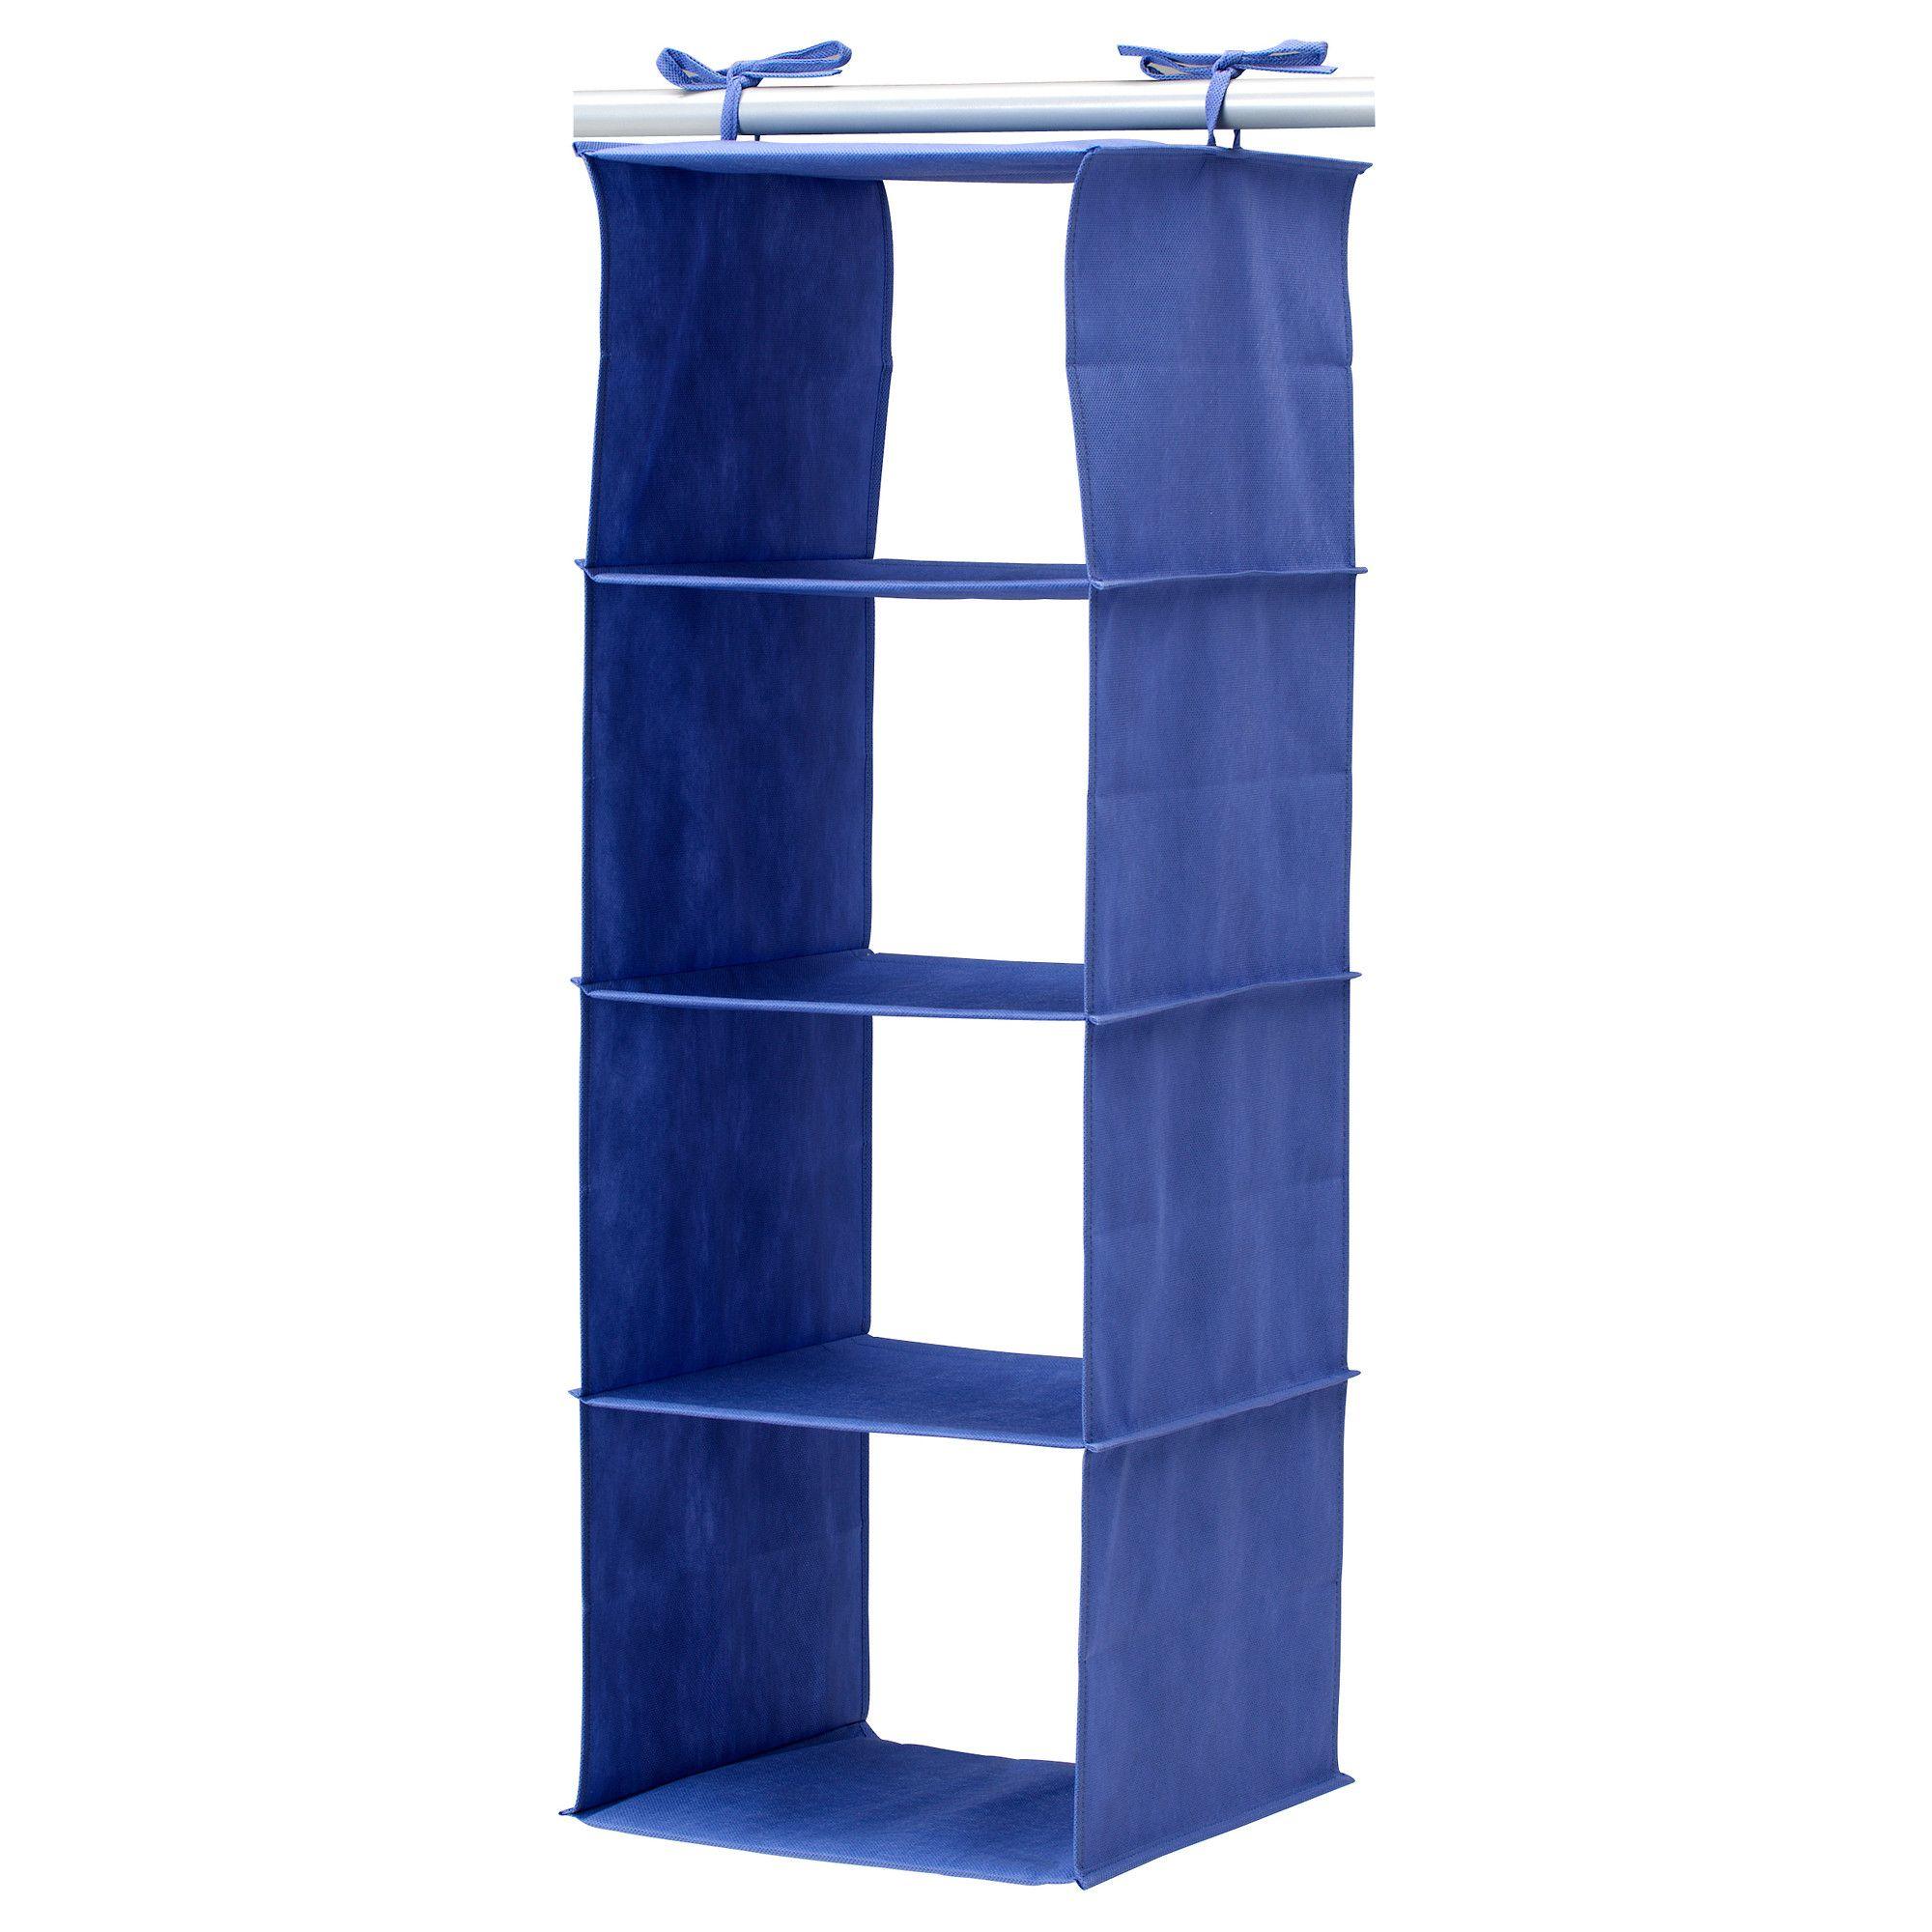 Ikea Kitchen Accessories Uae: For The Nursery Closet- Wish It